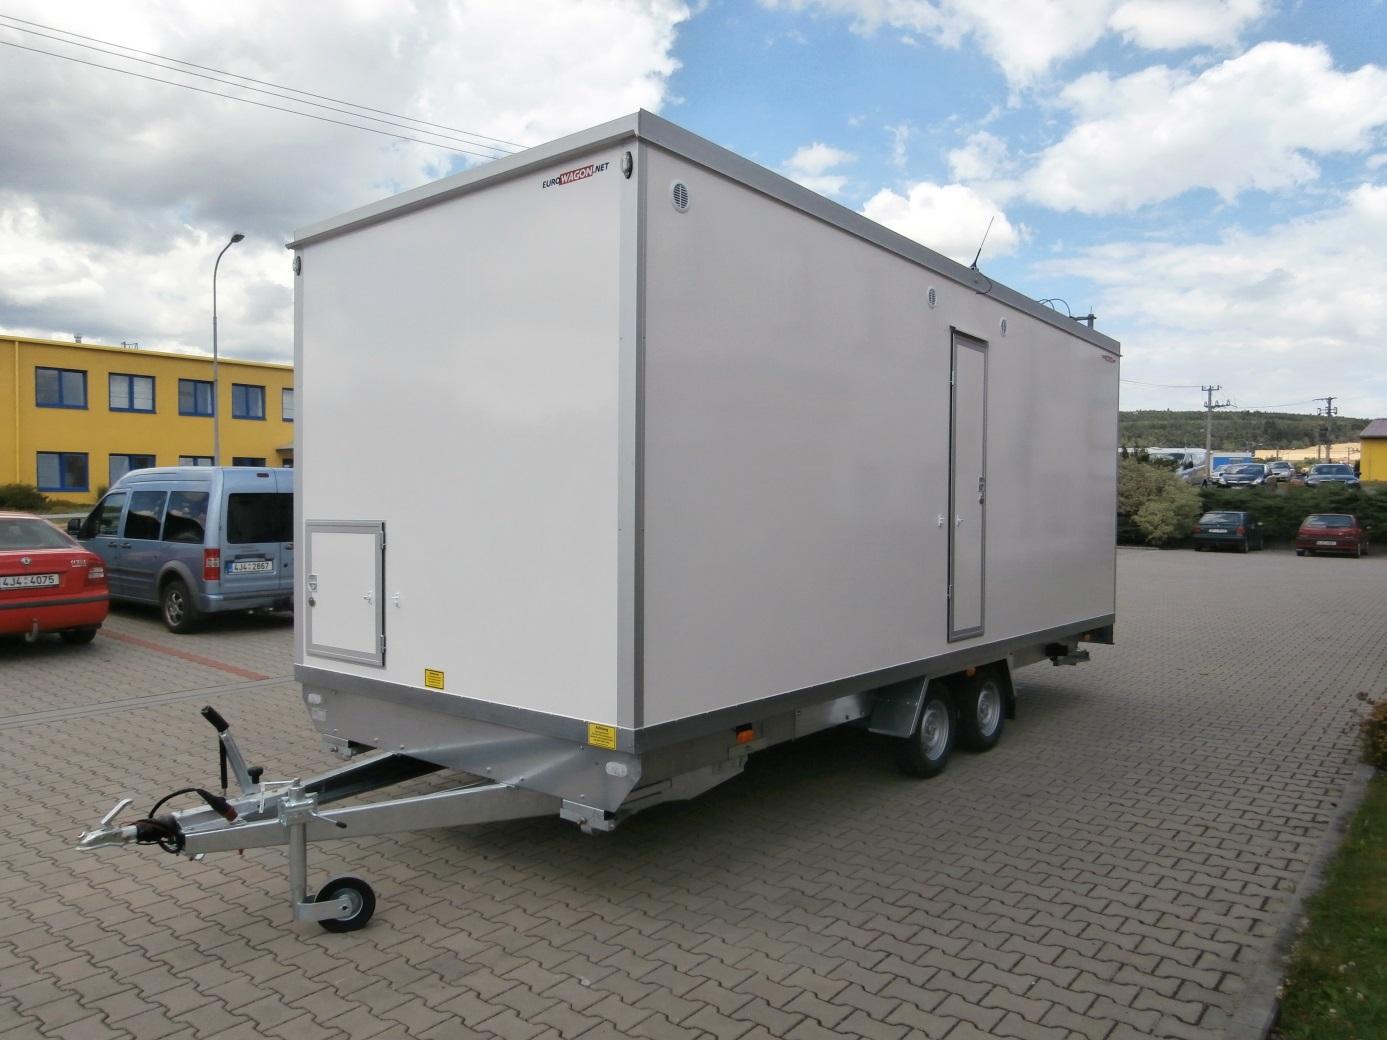 typ vip wc 3 1 5 61 toilettenwagen eurowagon. Black Bedroom Furniture Sets. Home Design Ideas